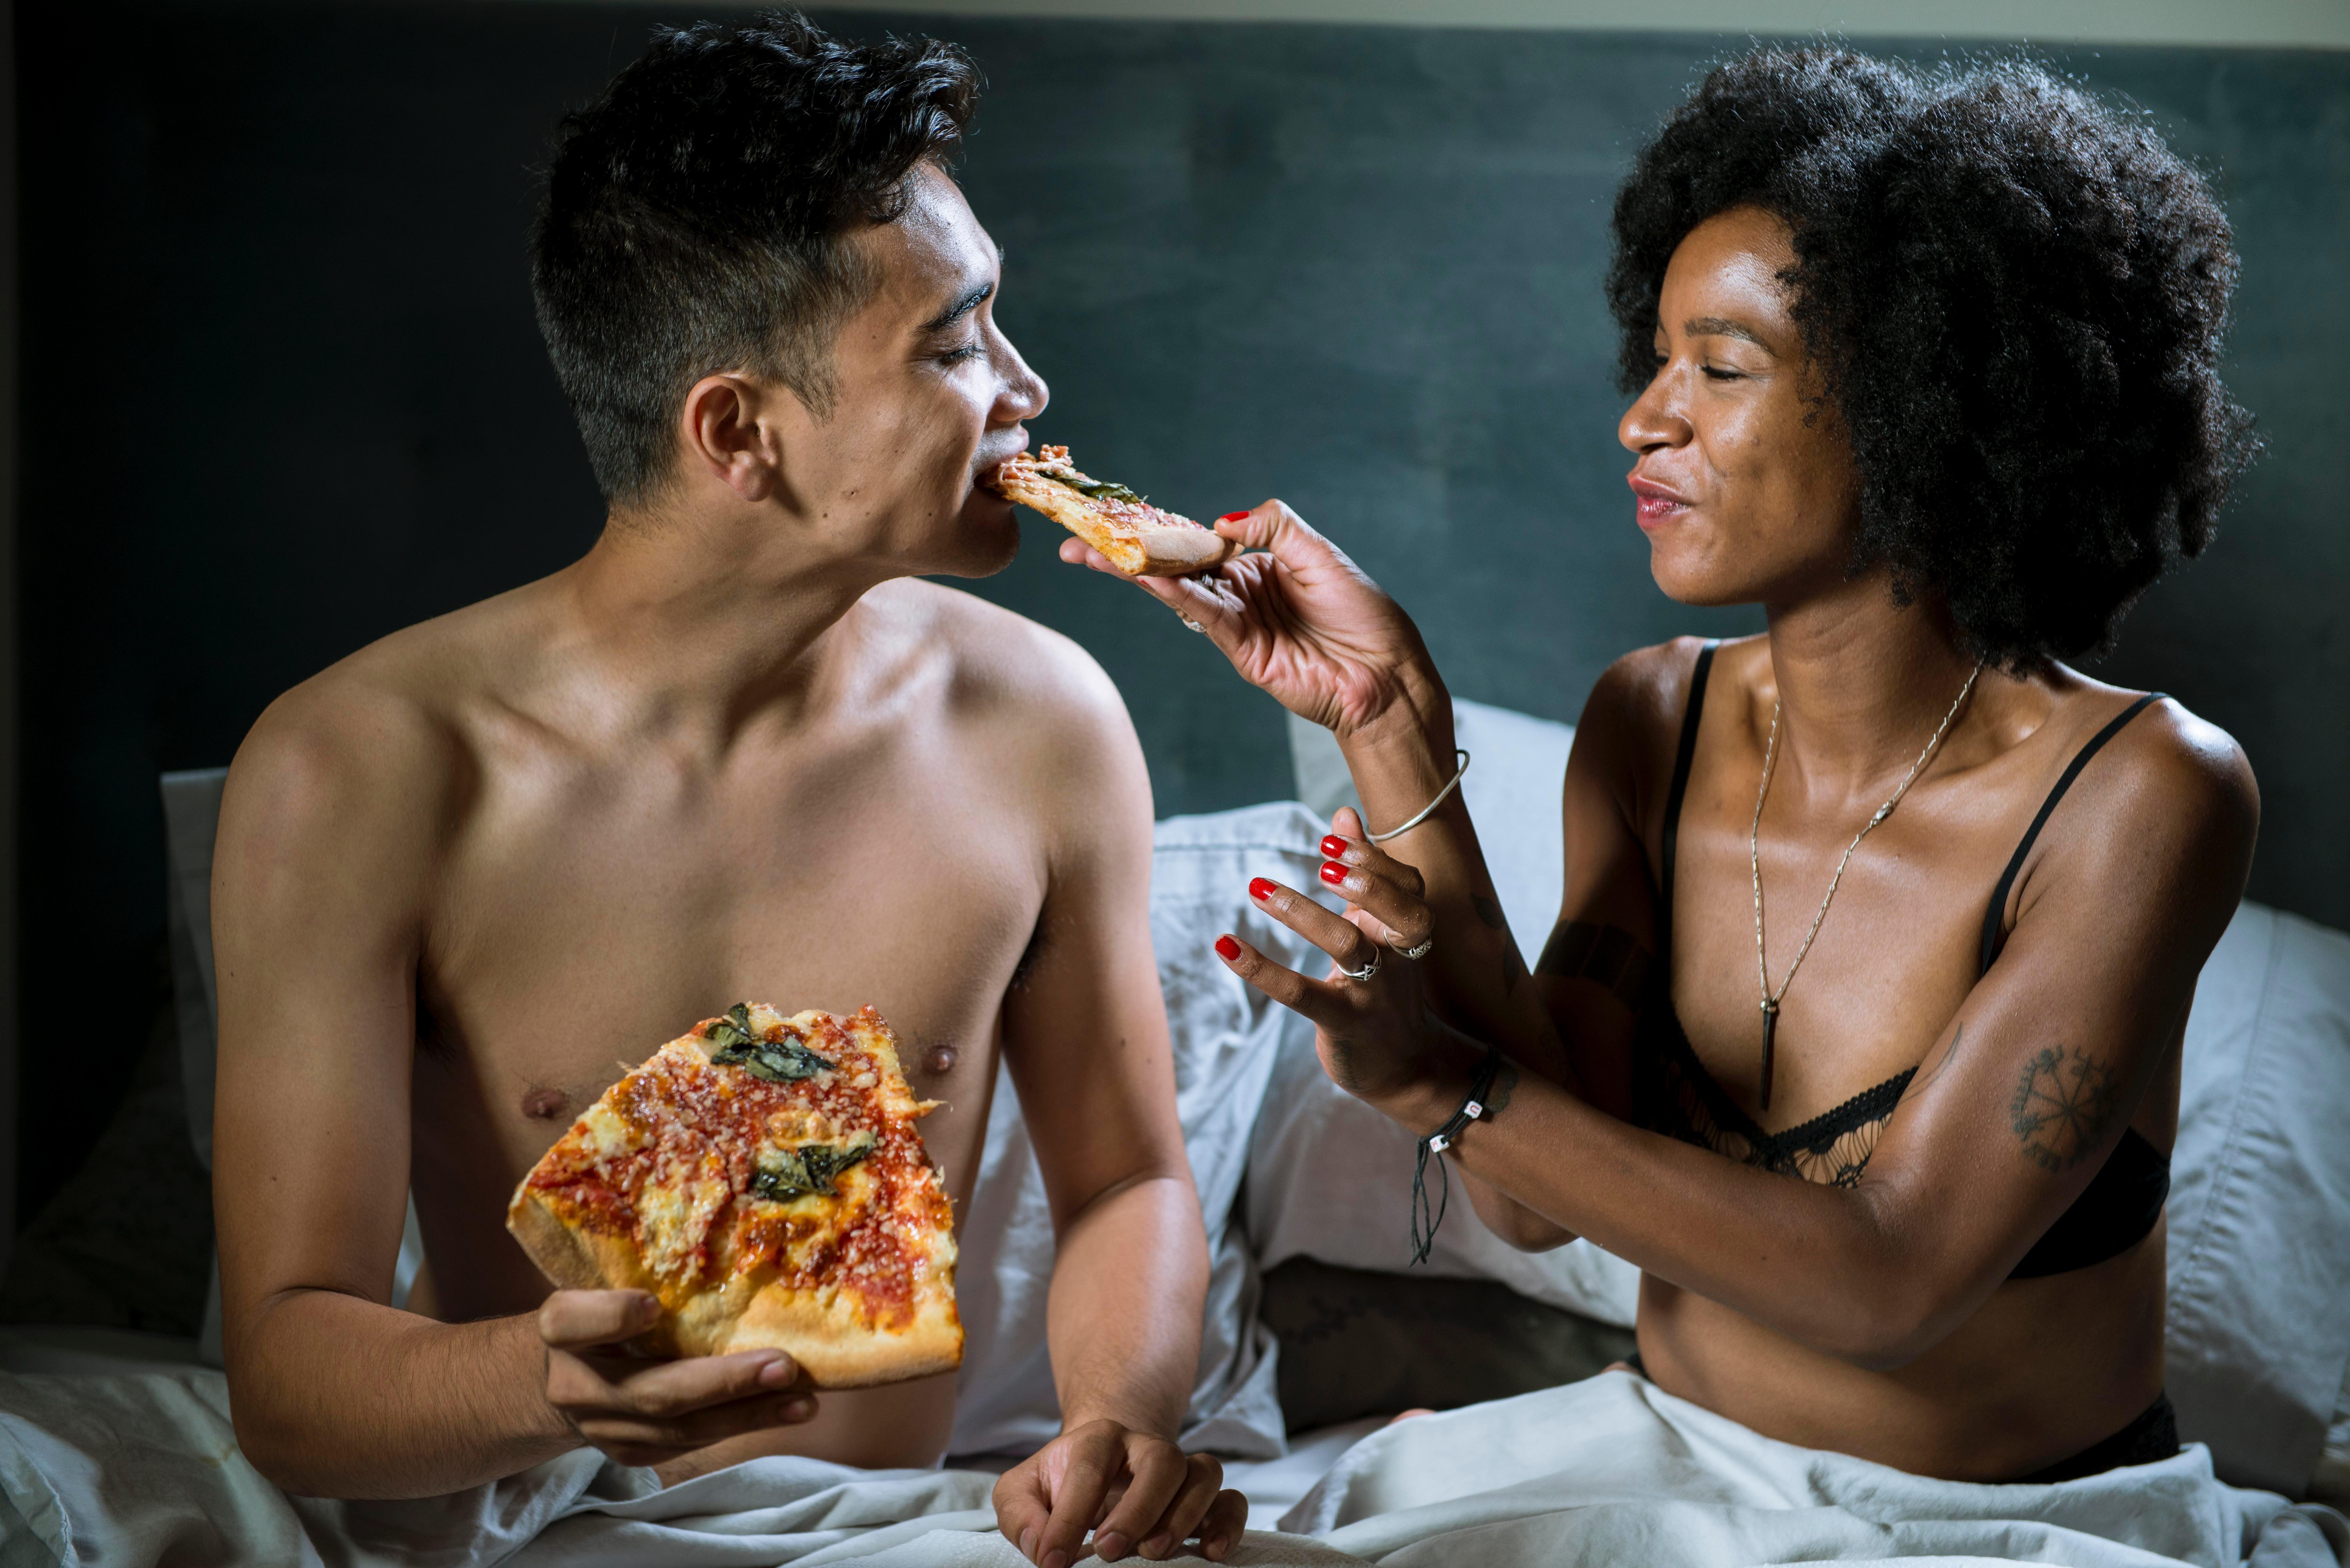 Video sharing orgasm